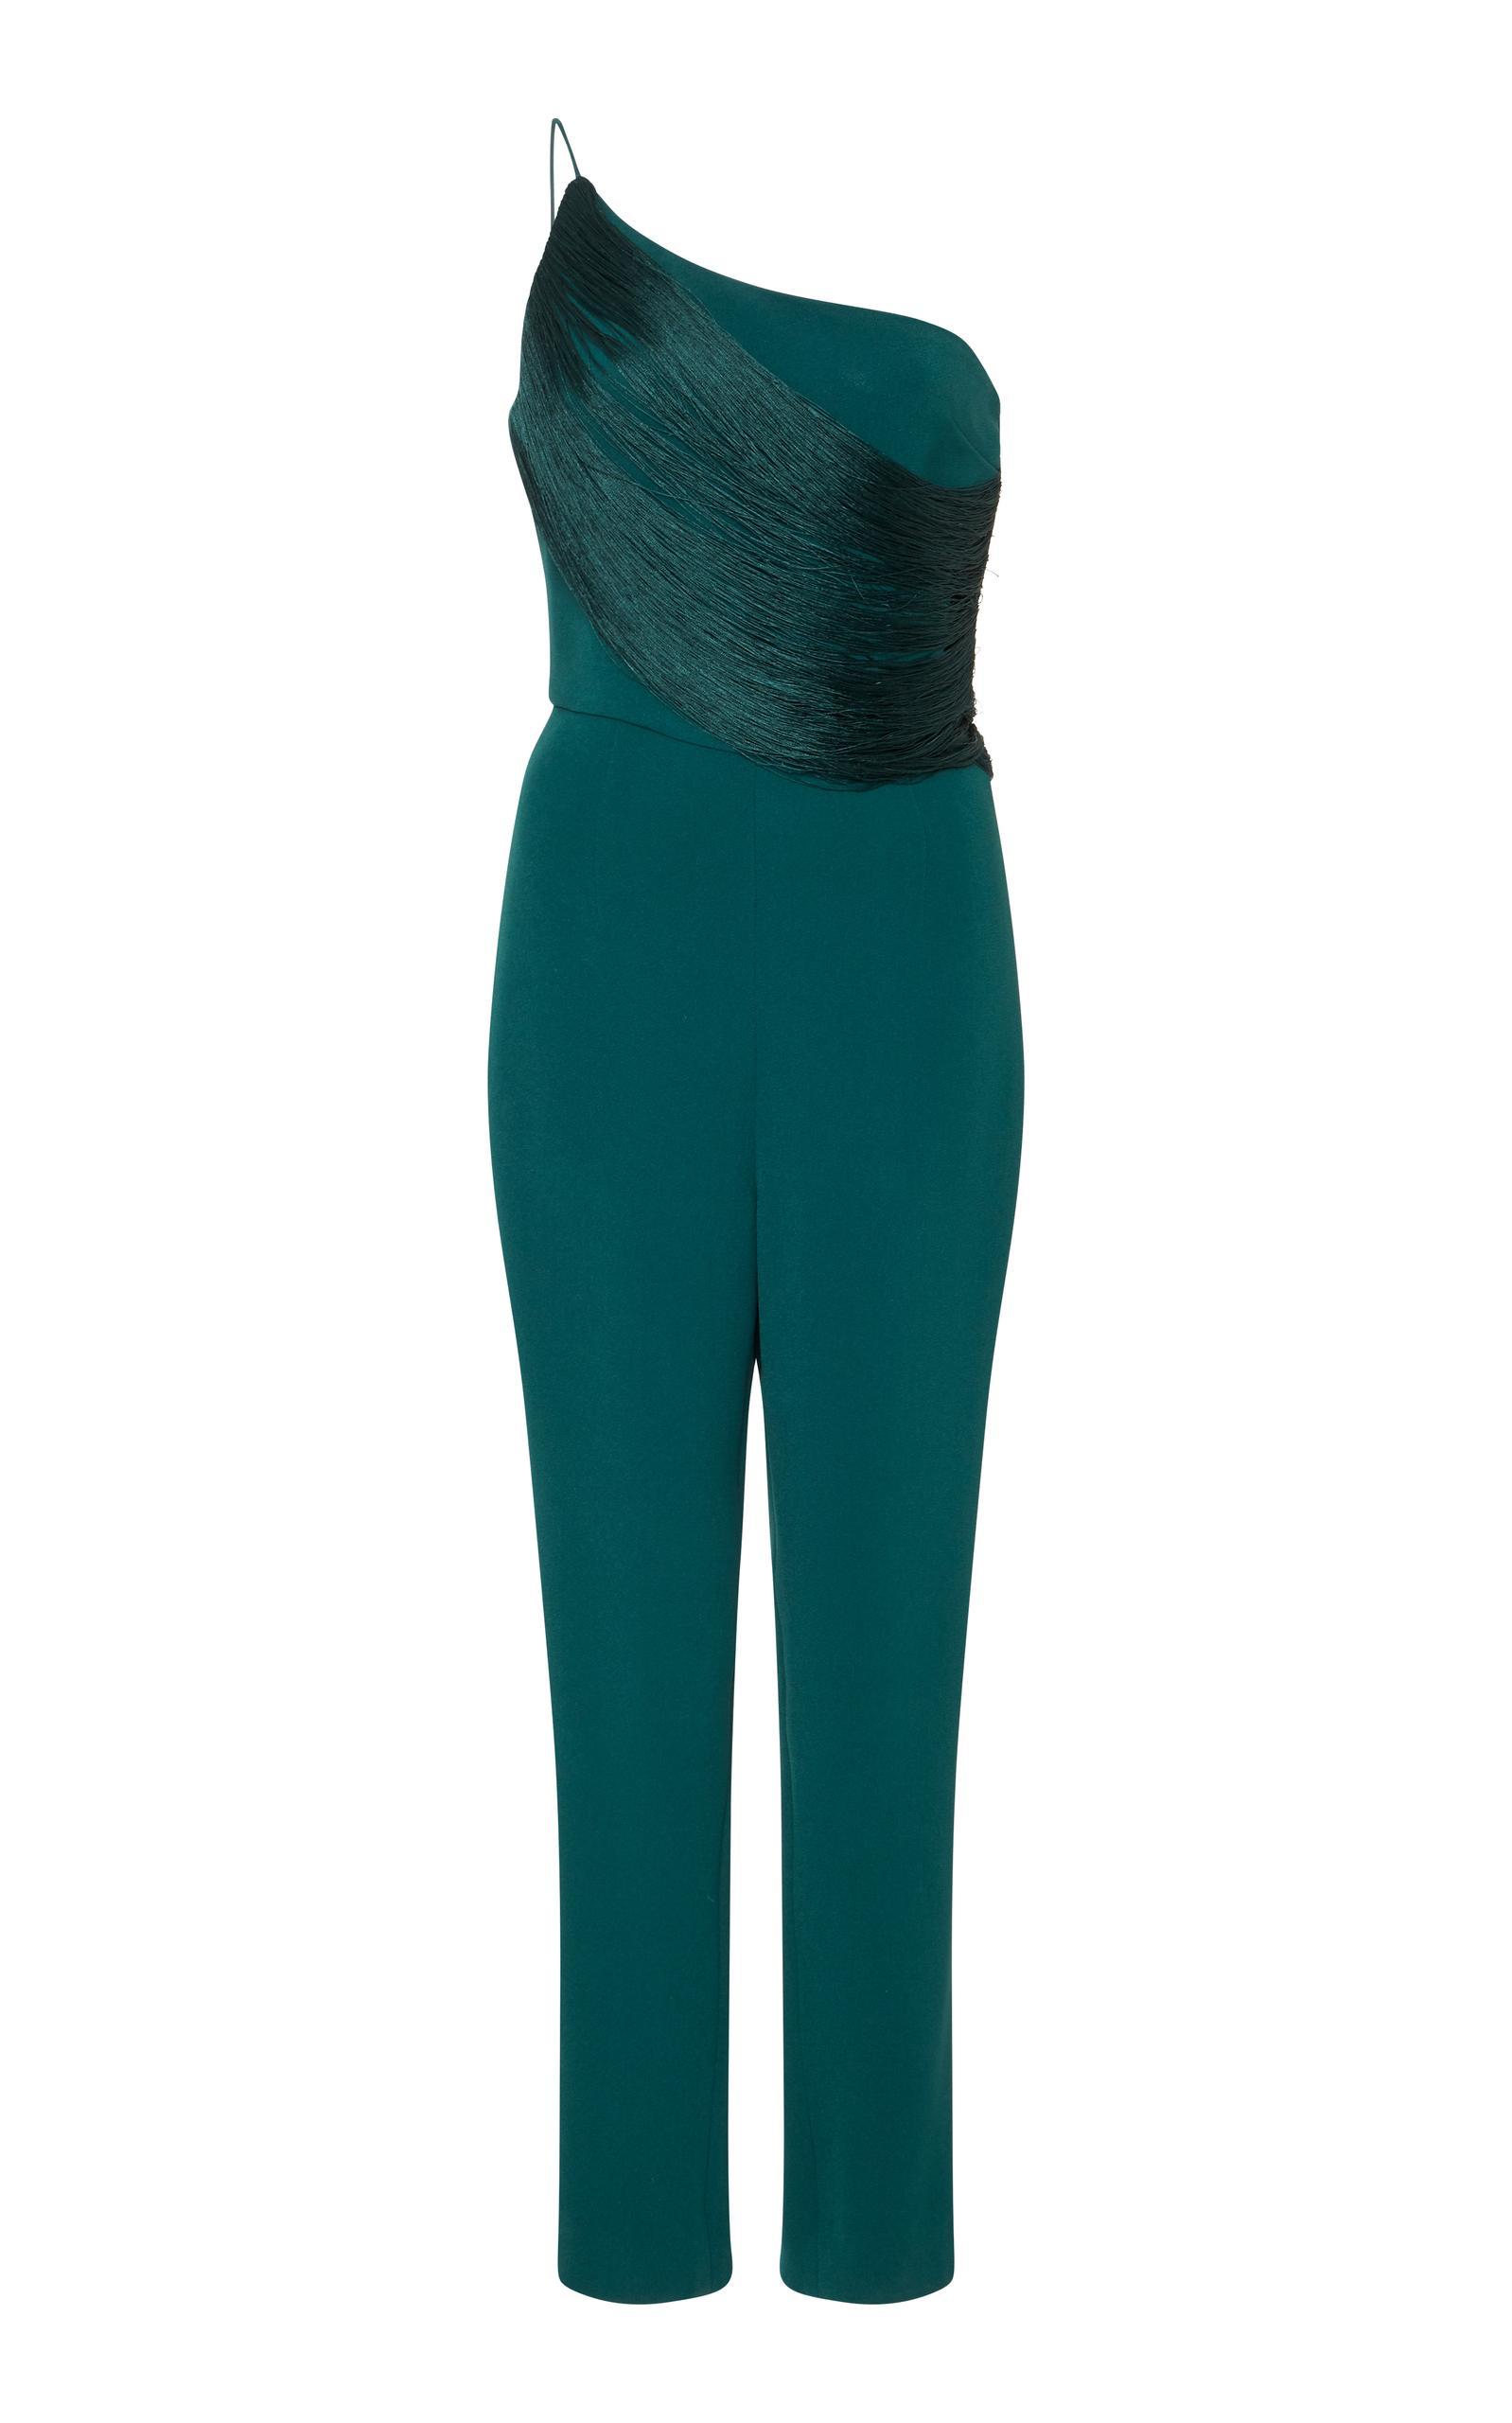 ff26fe8d04a Cushnie Et Ochs Saskia One Shoulder Jumpsuit In Green